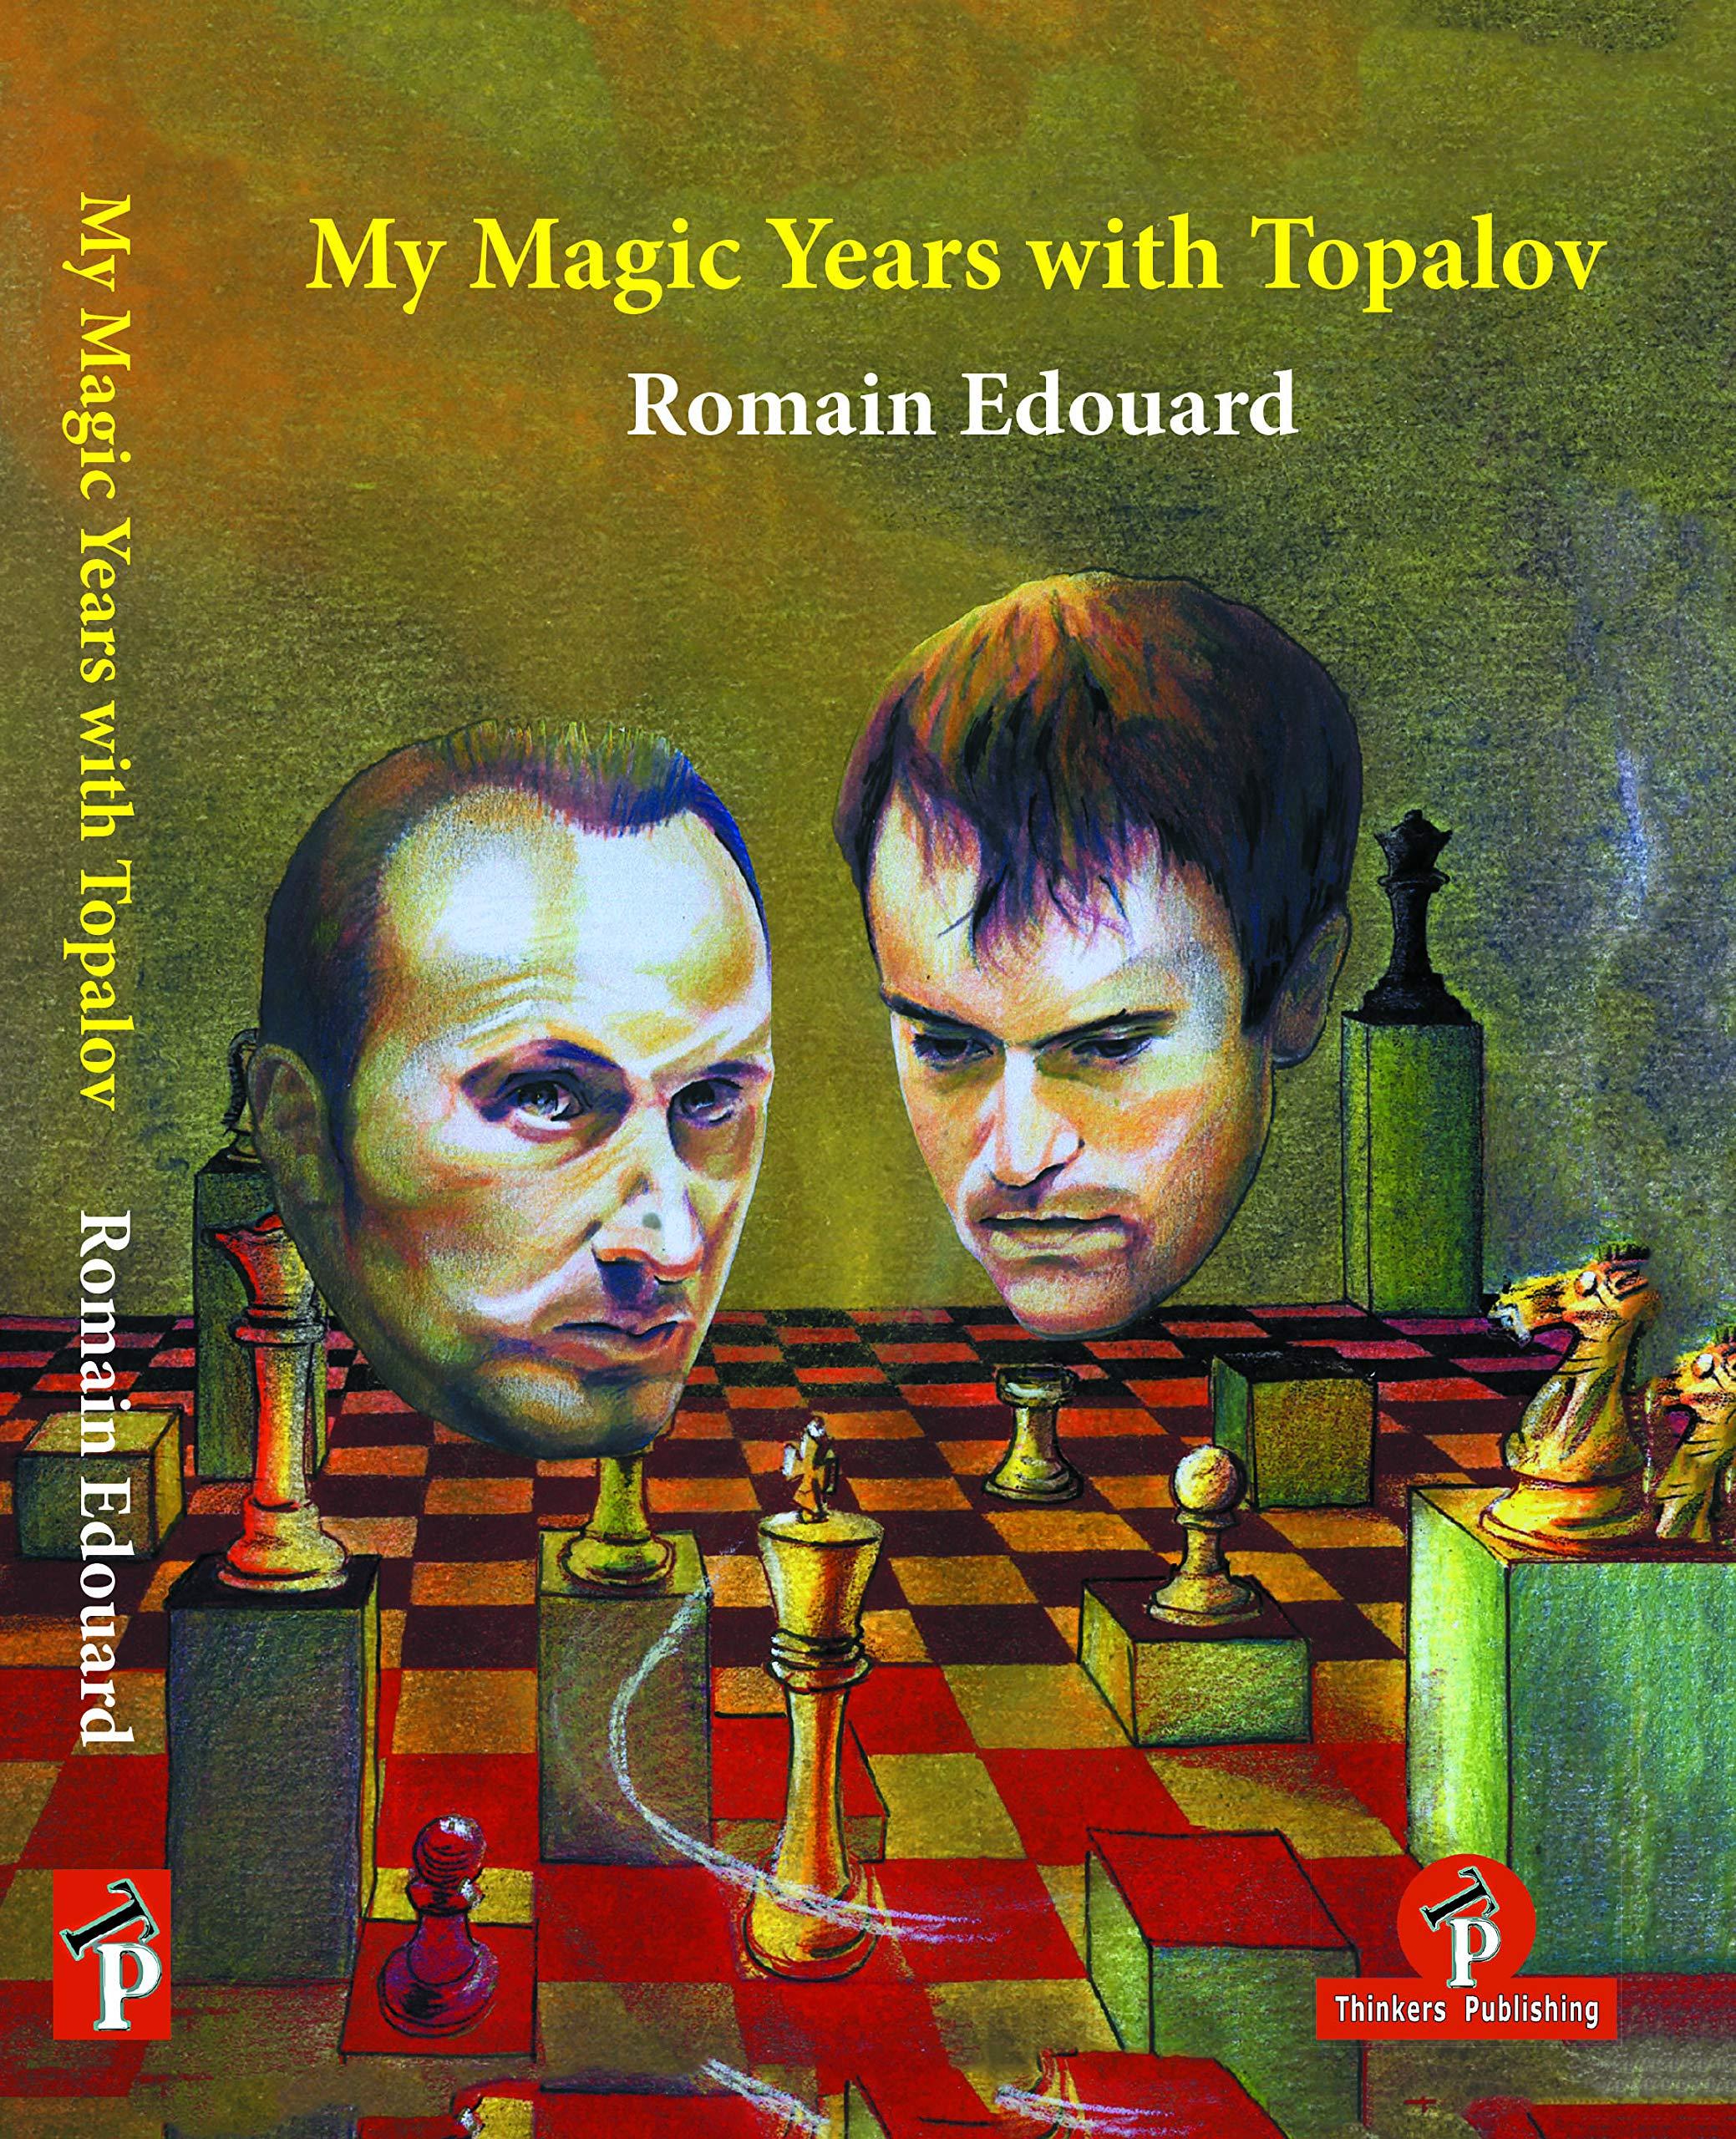 My Magic Years With Topalov - Romain Edouard PDF+PGN+ePub 91ruL-RvP0L